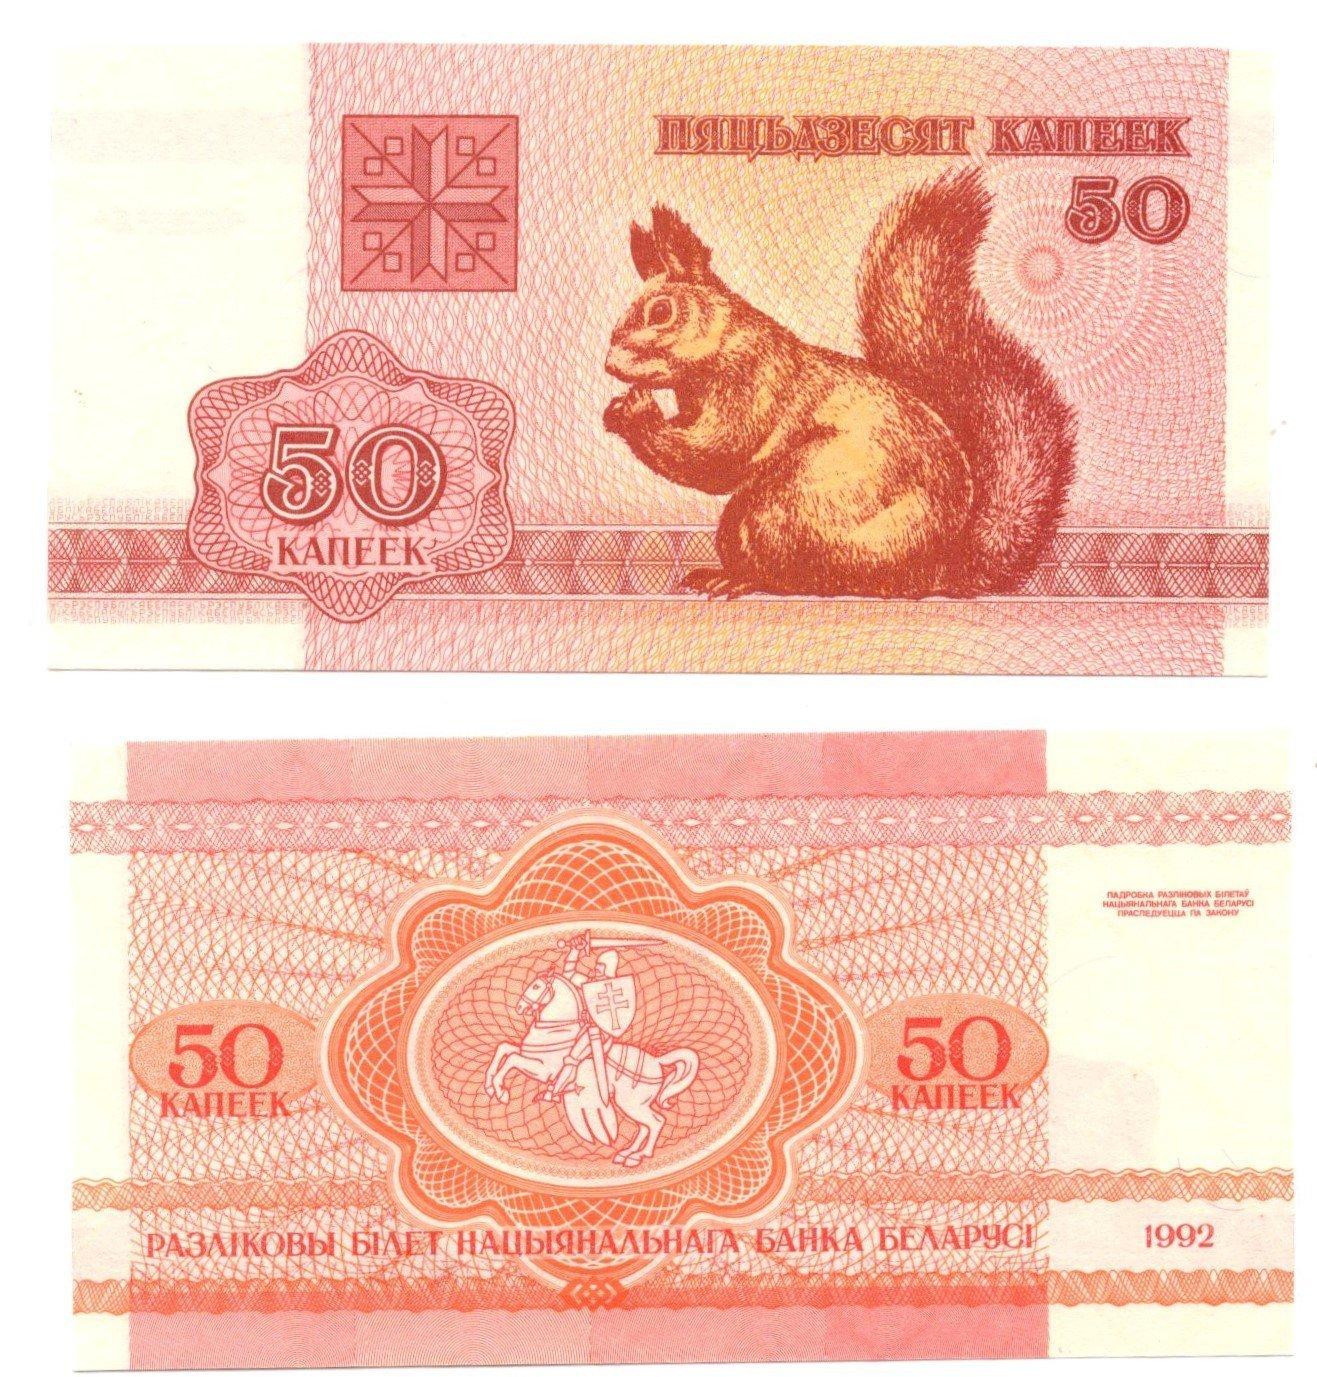 belARUS 50 KOPEK